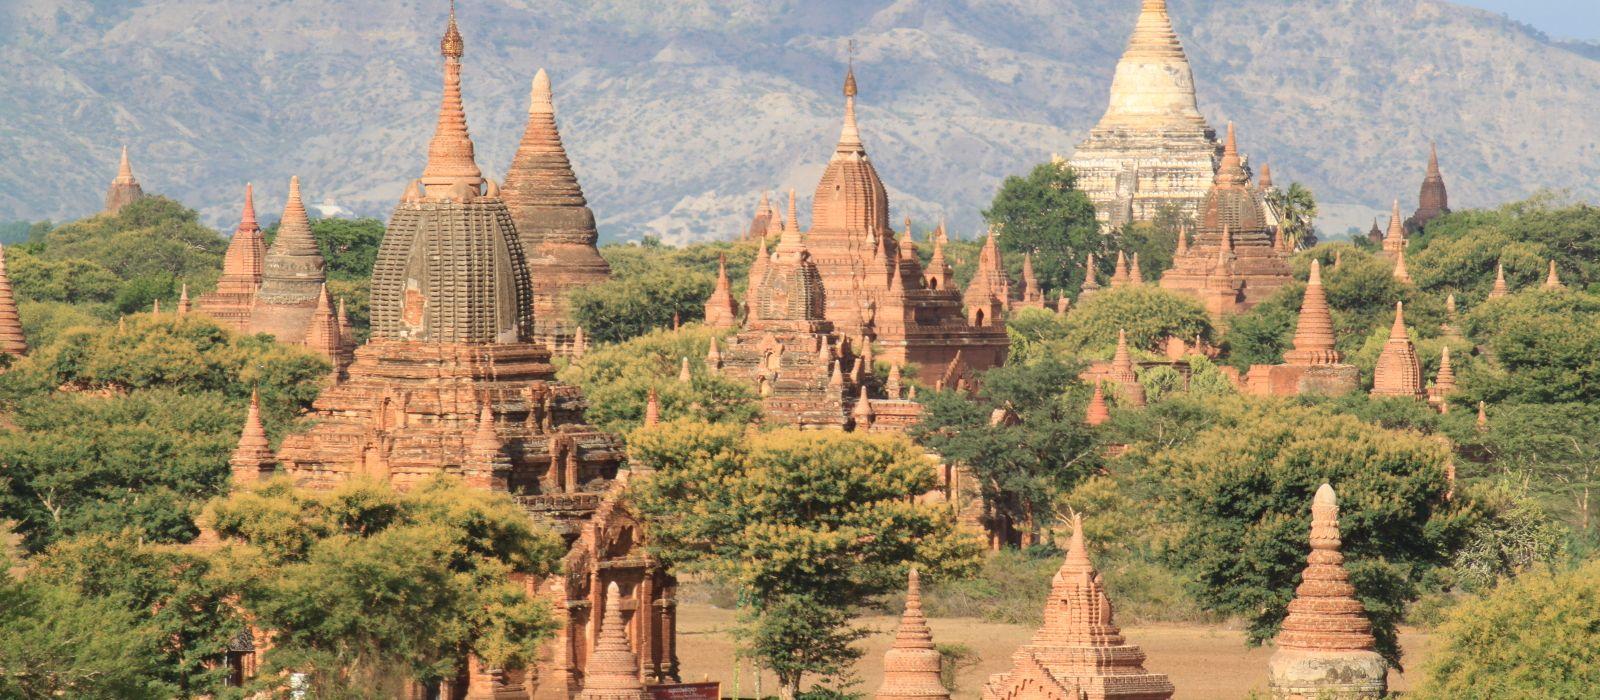 Reiseziel Nyaung U Myanmar